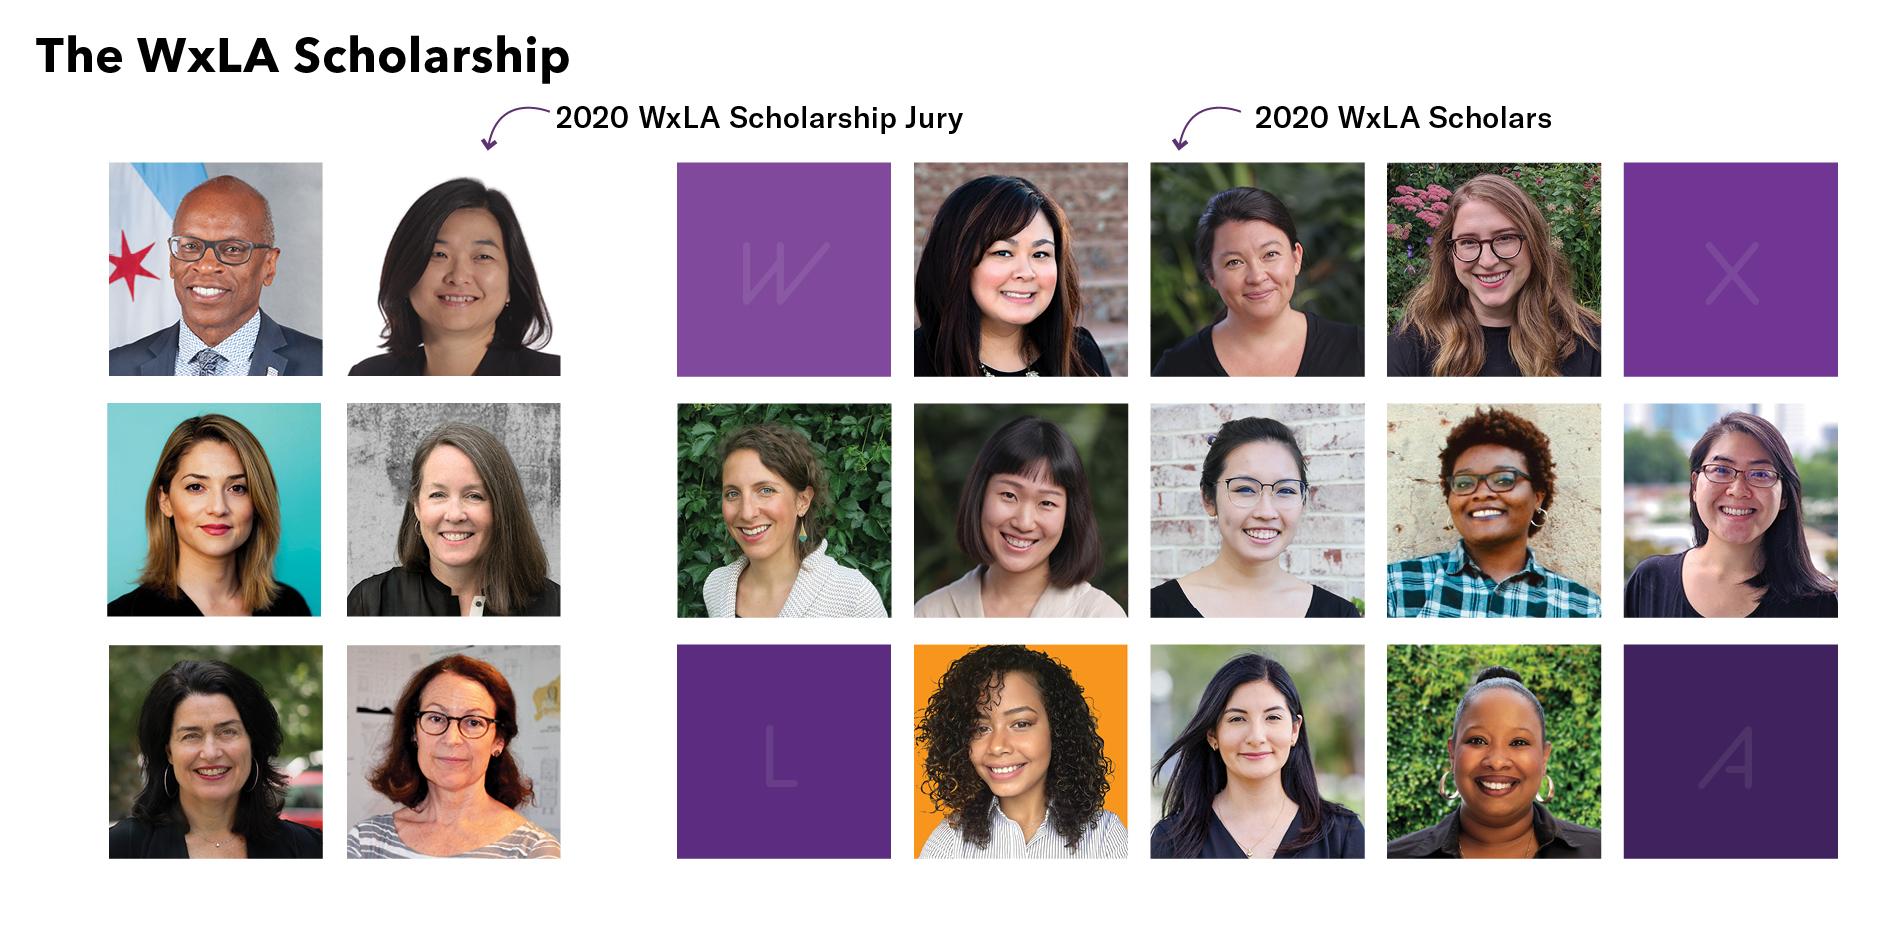 The WxLA Scholarship